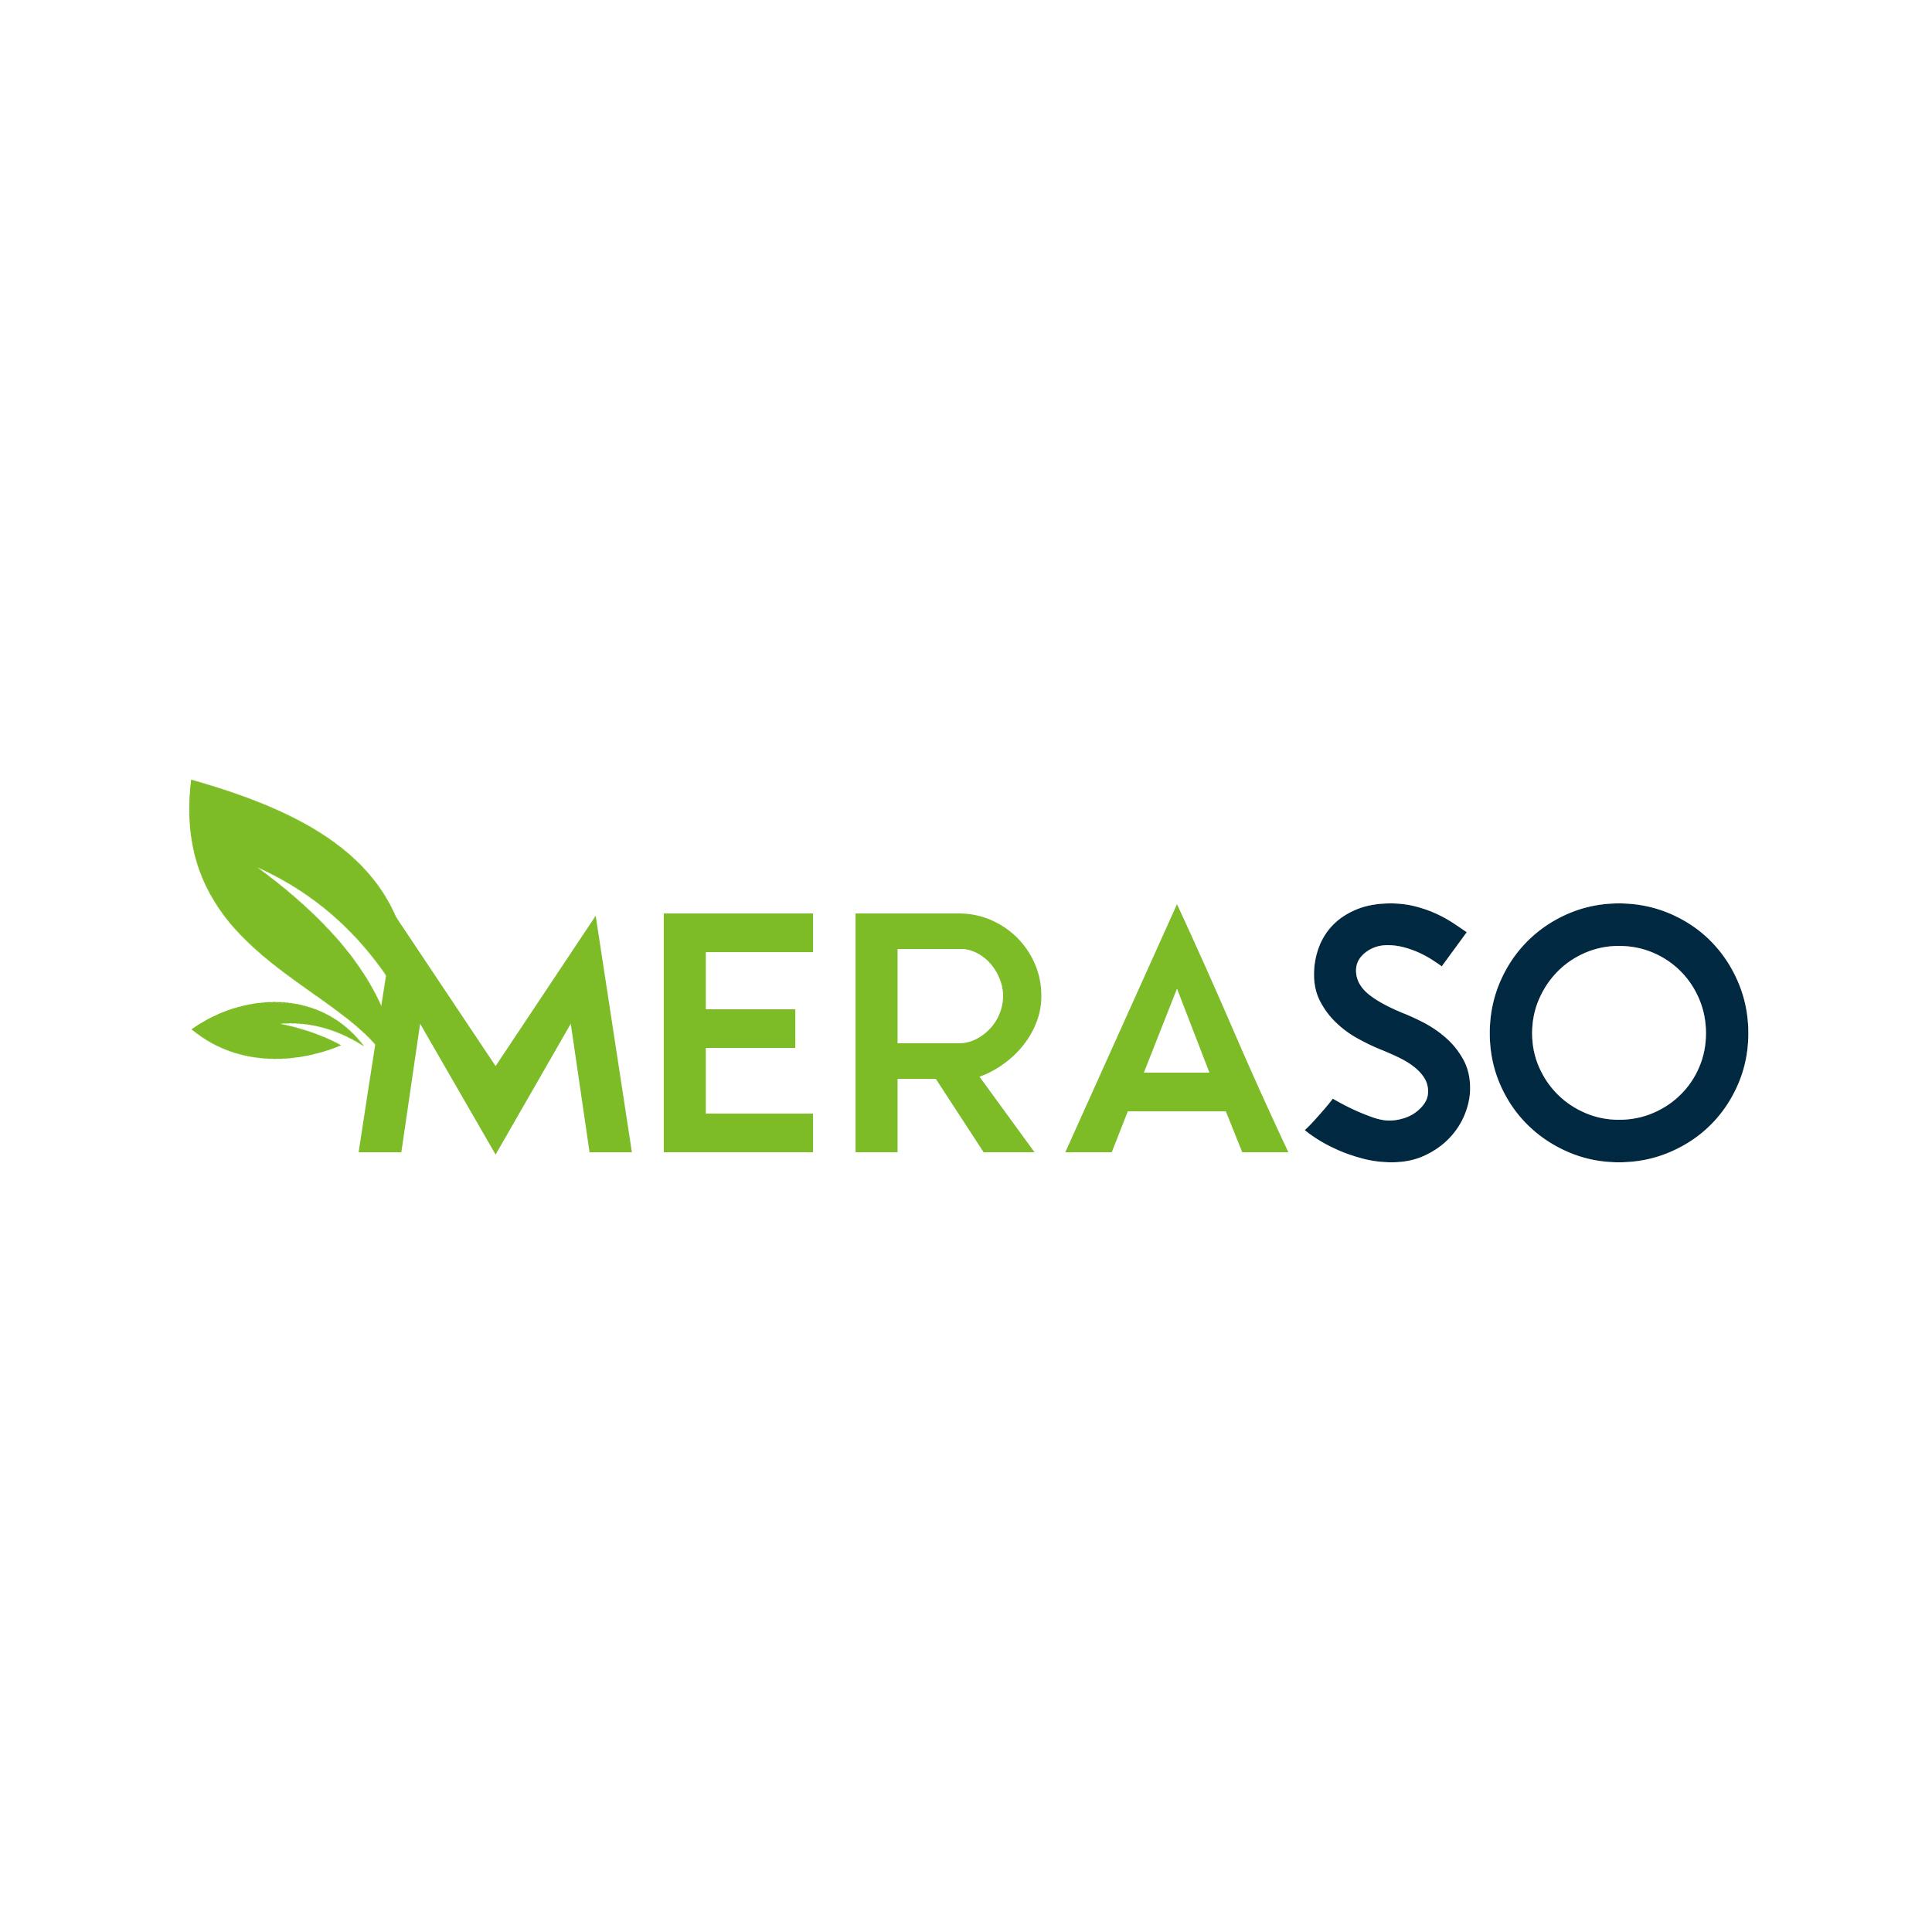 Meraso Logo design